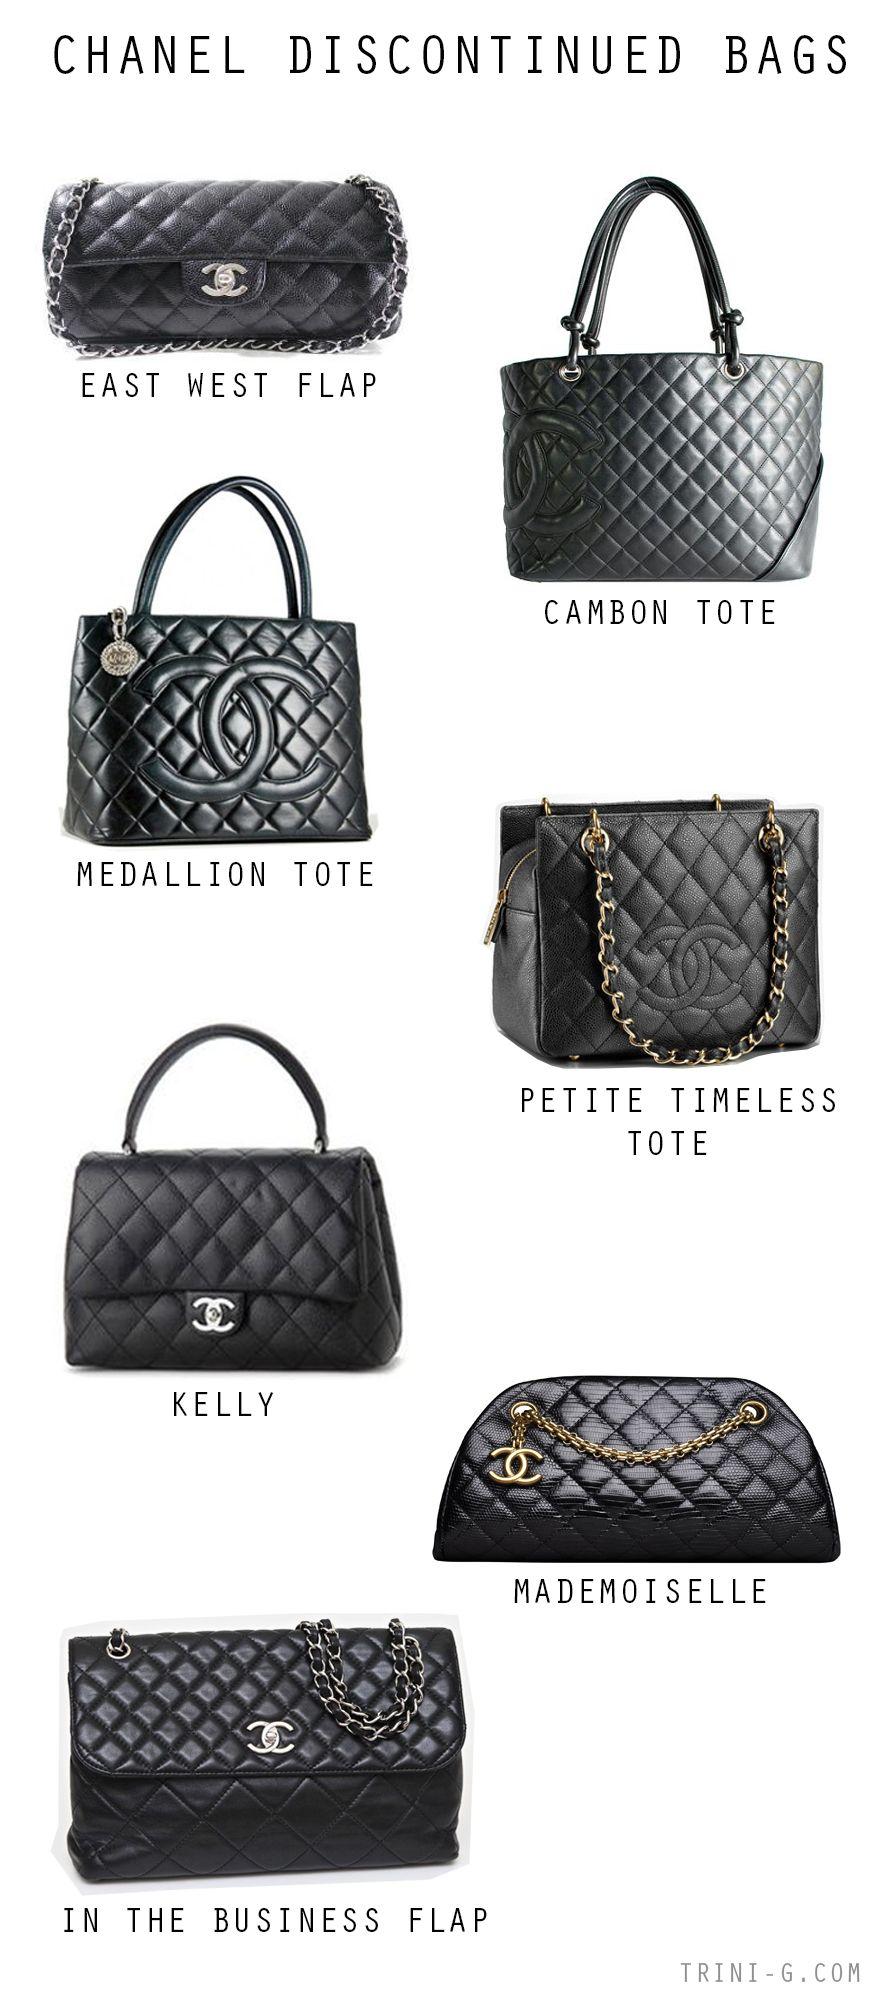 fbf8a34e2 Pin by Mercedes Banks-Williams on Bag Addiction | Hermes handbags, Chanel  handbags, Prada handbags